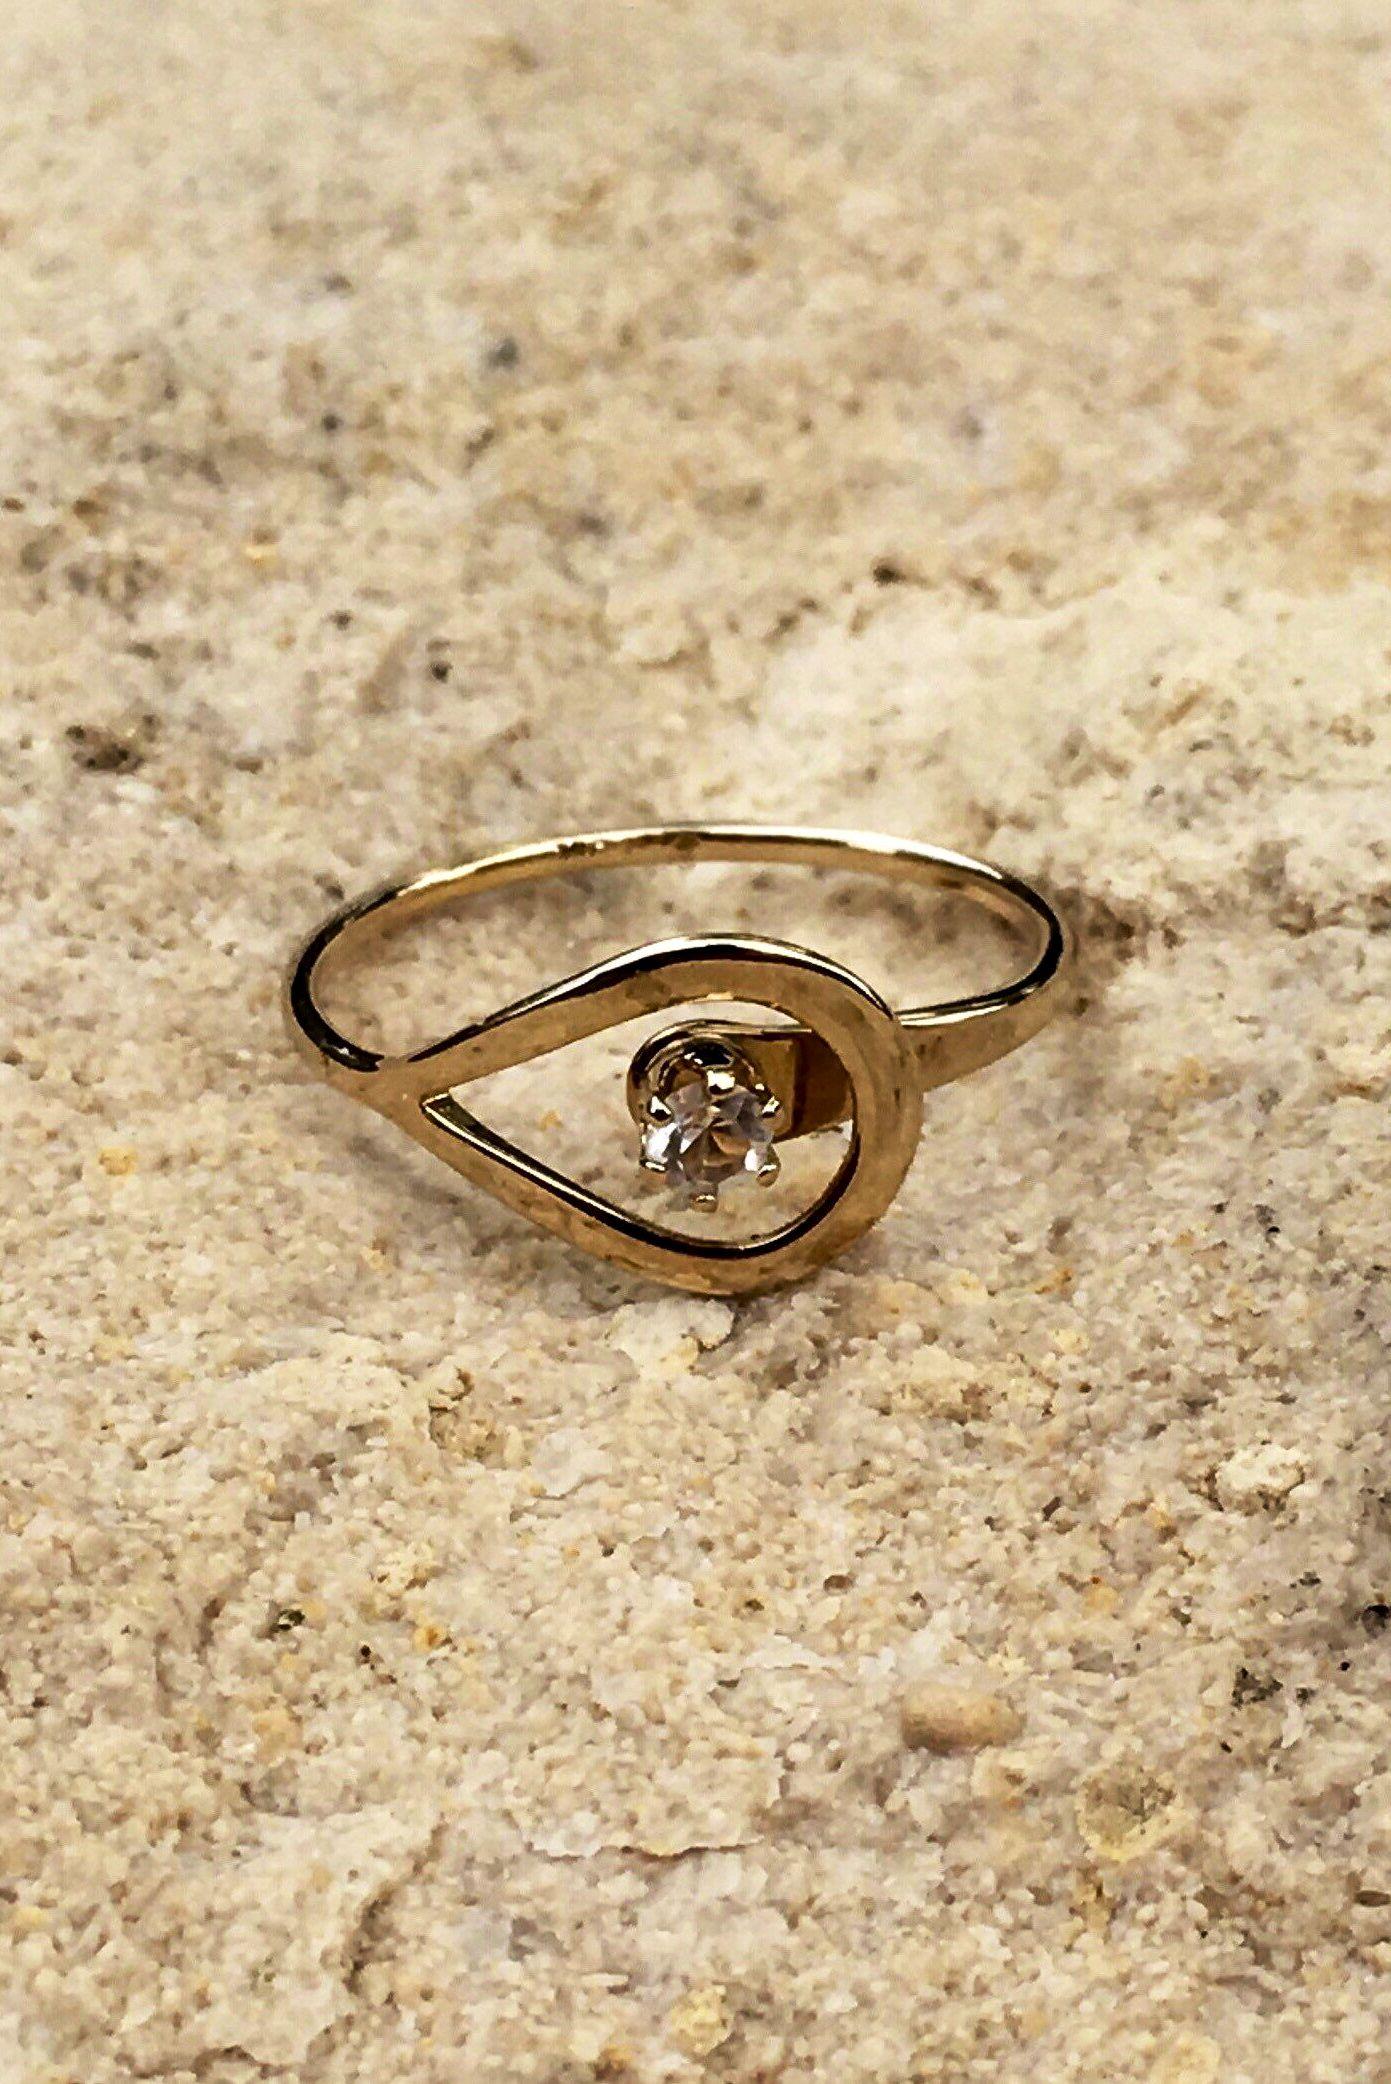 Avon Catch A Star Gold Teardrop Diamond Ring Etsy Teardrop Diamond Ring Classic Engagement Ring Solitaire Single Diamond Ring